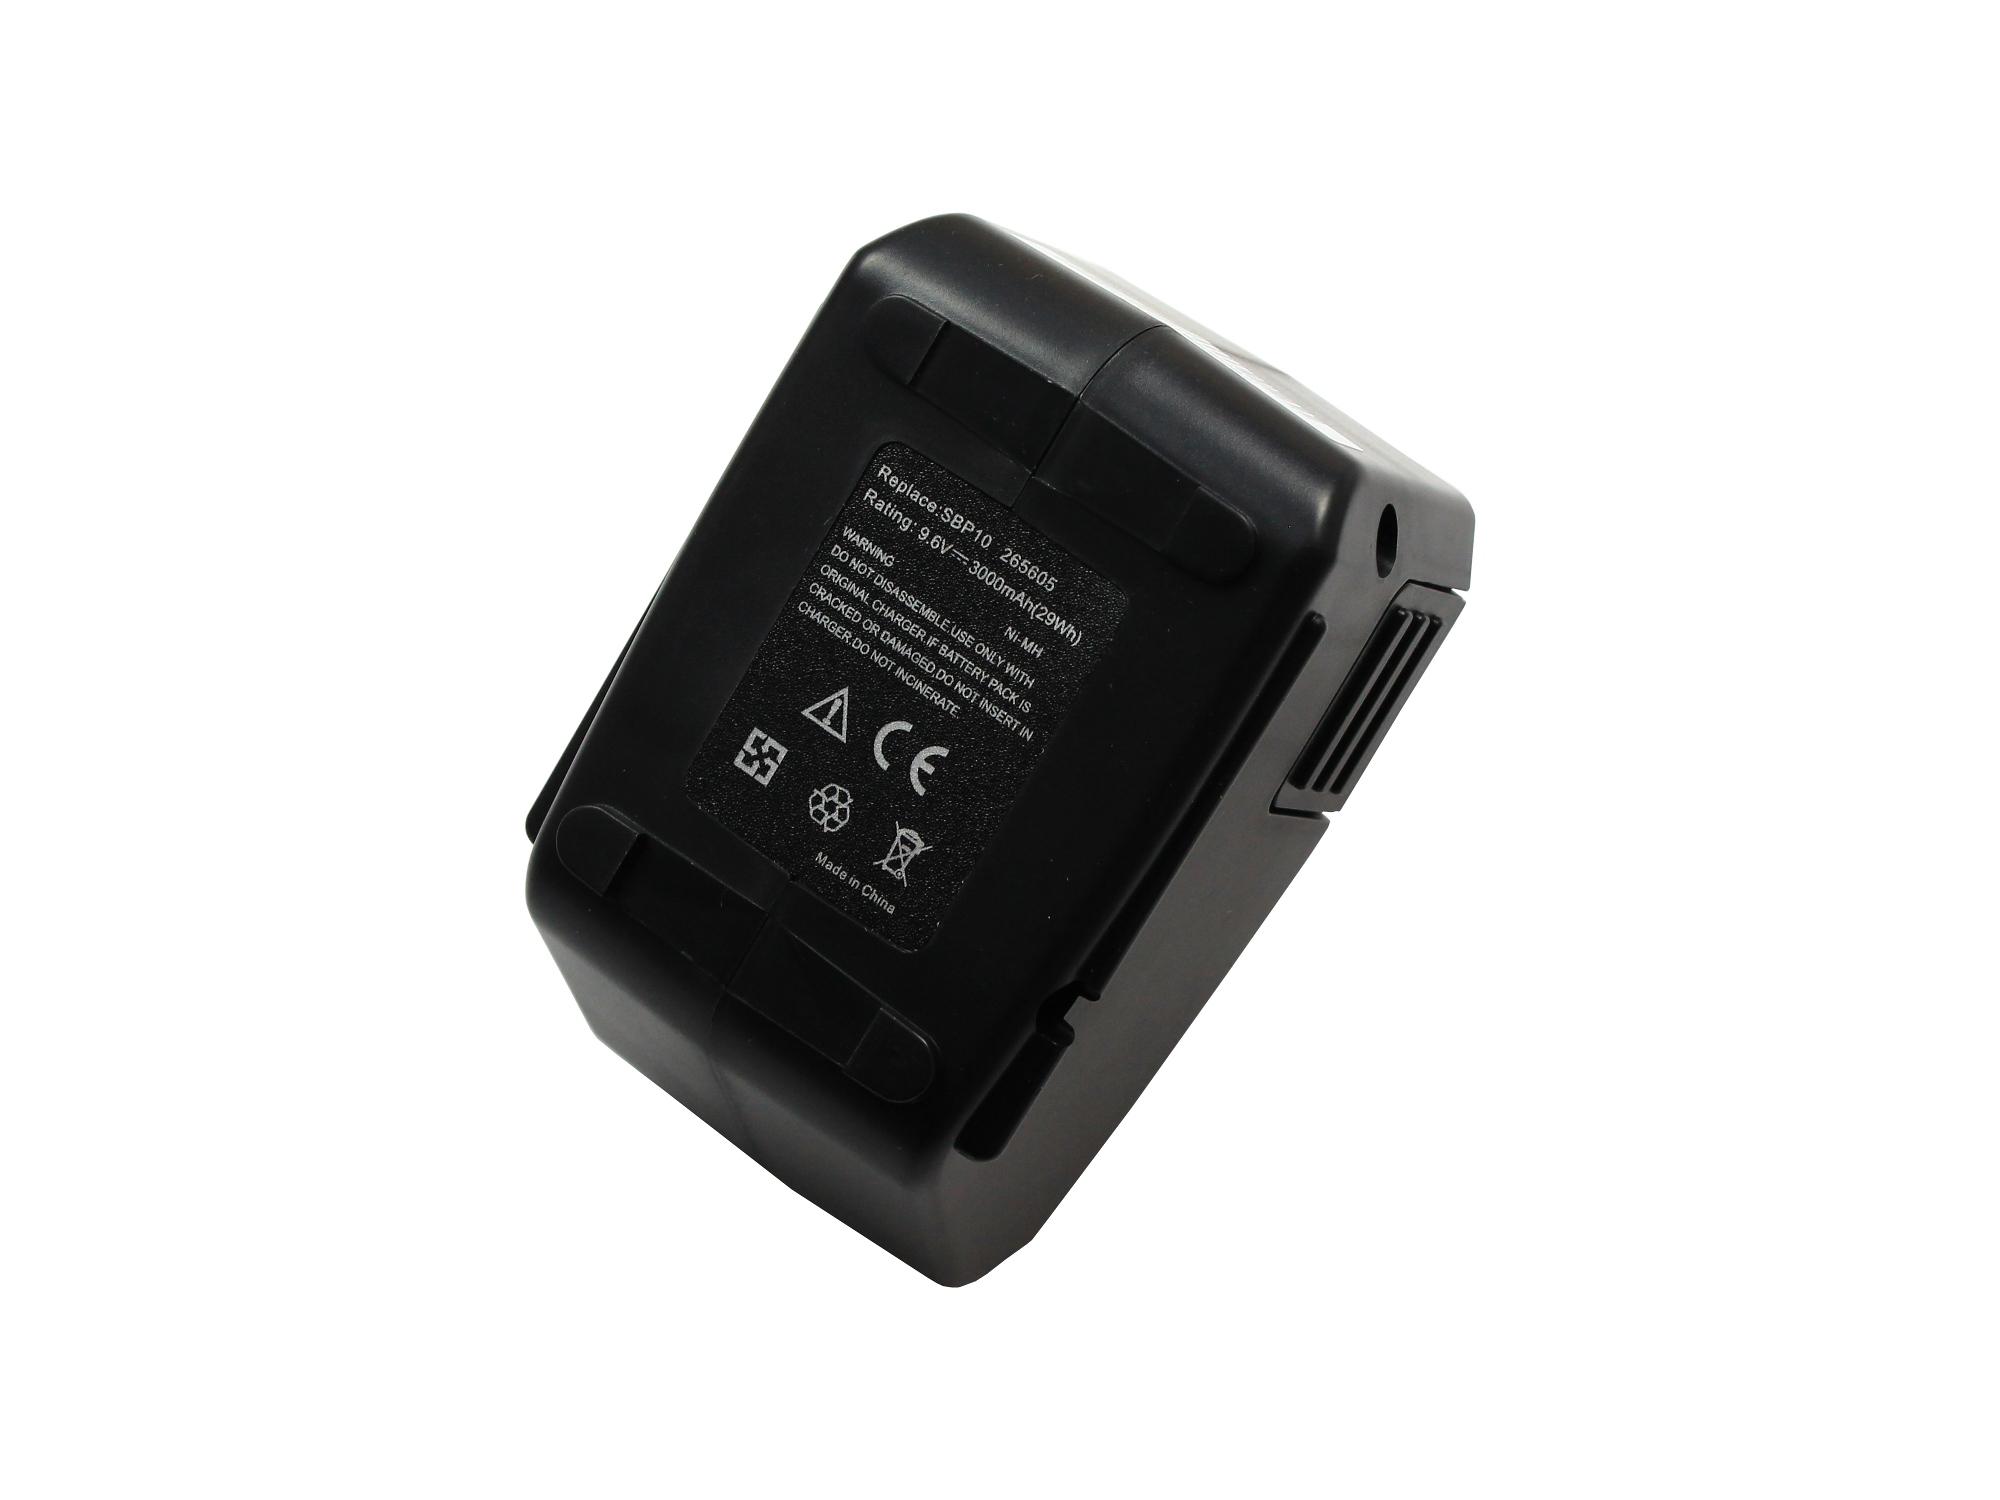 Acumulator compatibil 3000mAh Hilti SF100, SF100-A, SFB105, SB10